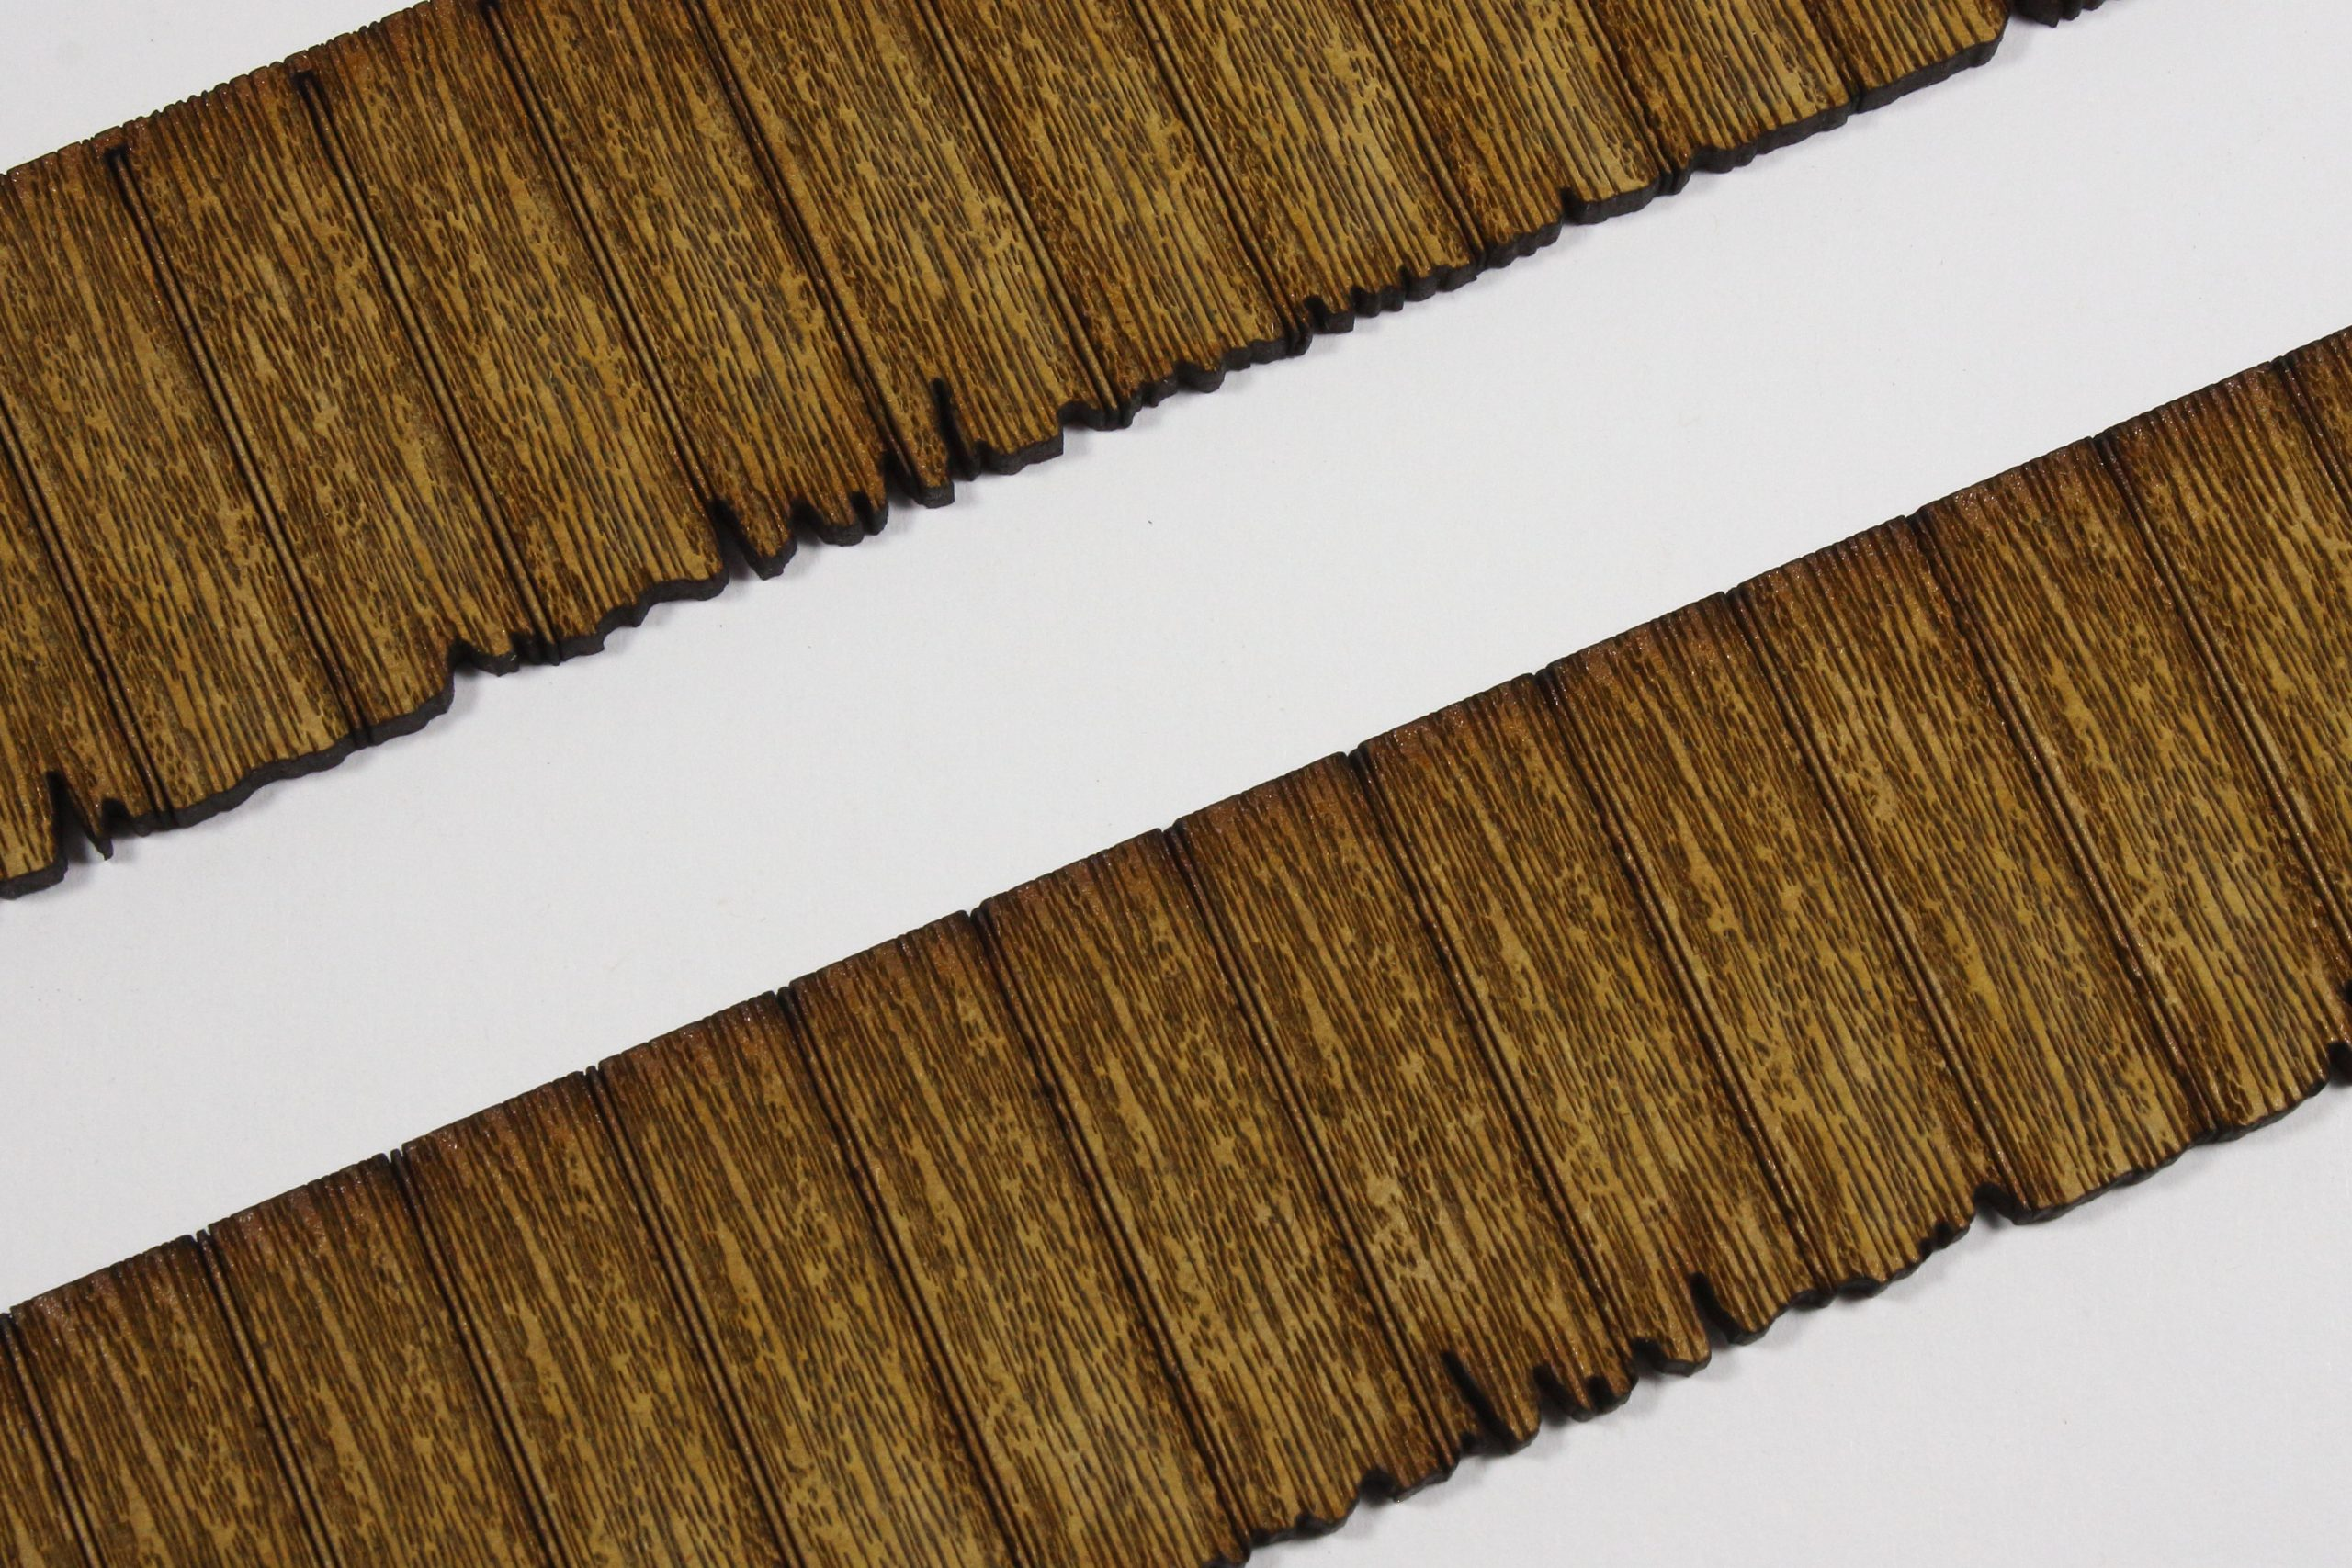 Bild-9-scaled Fachwerkhaus mit Holzschuppen - Lasercut Modellbaushop 1:35